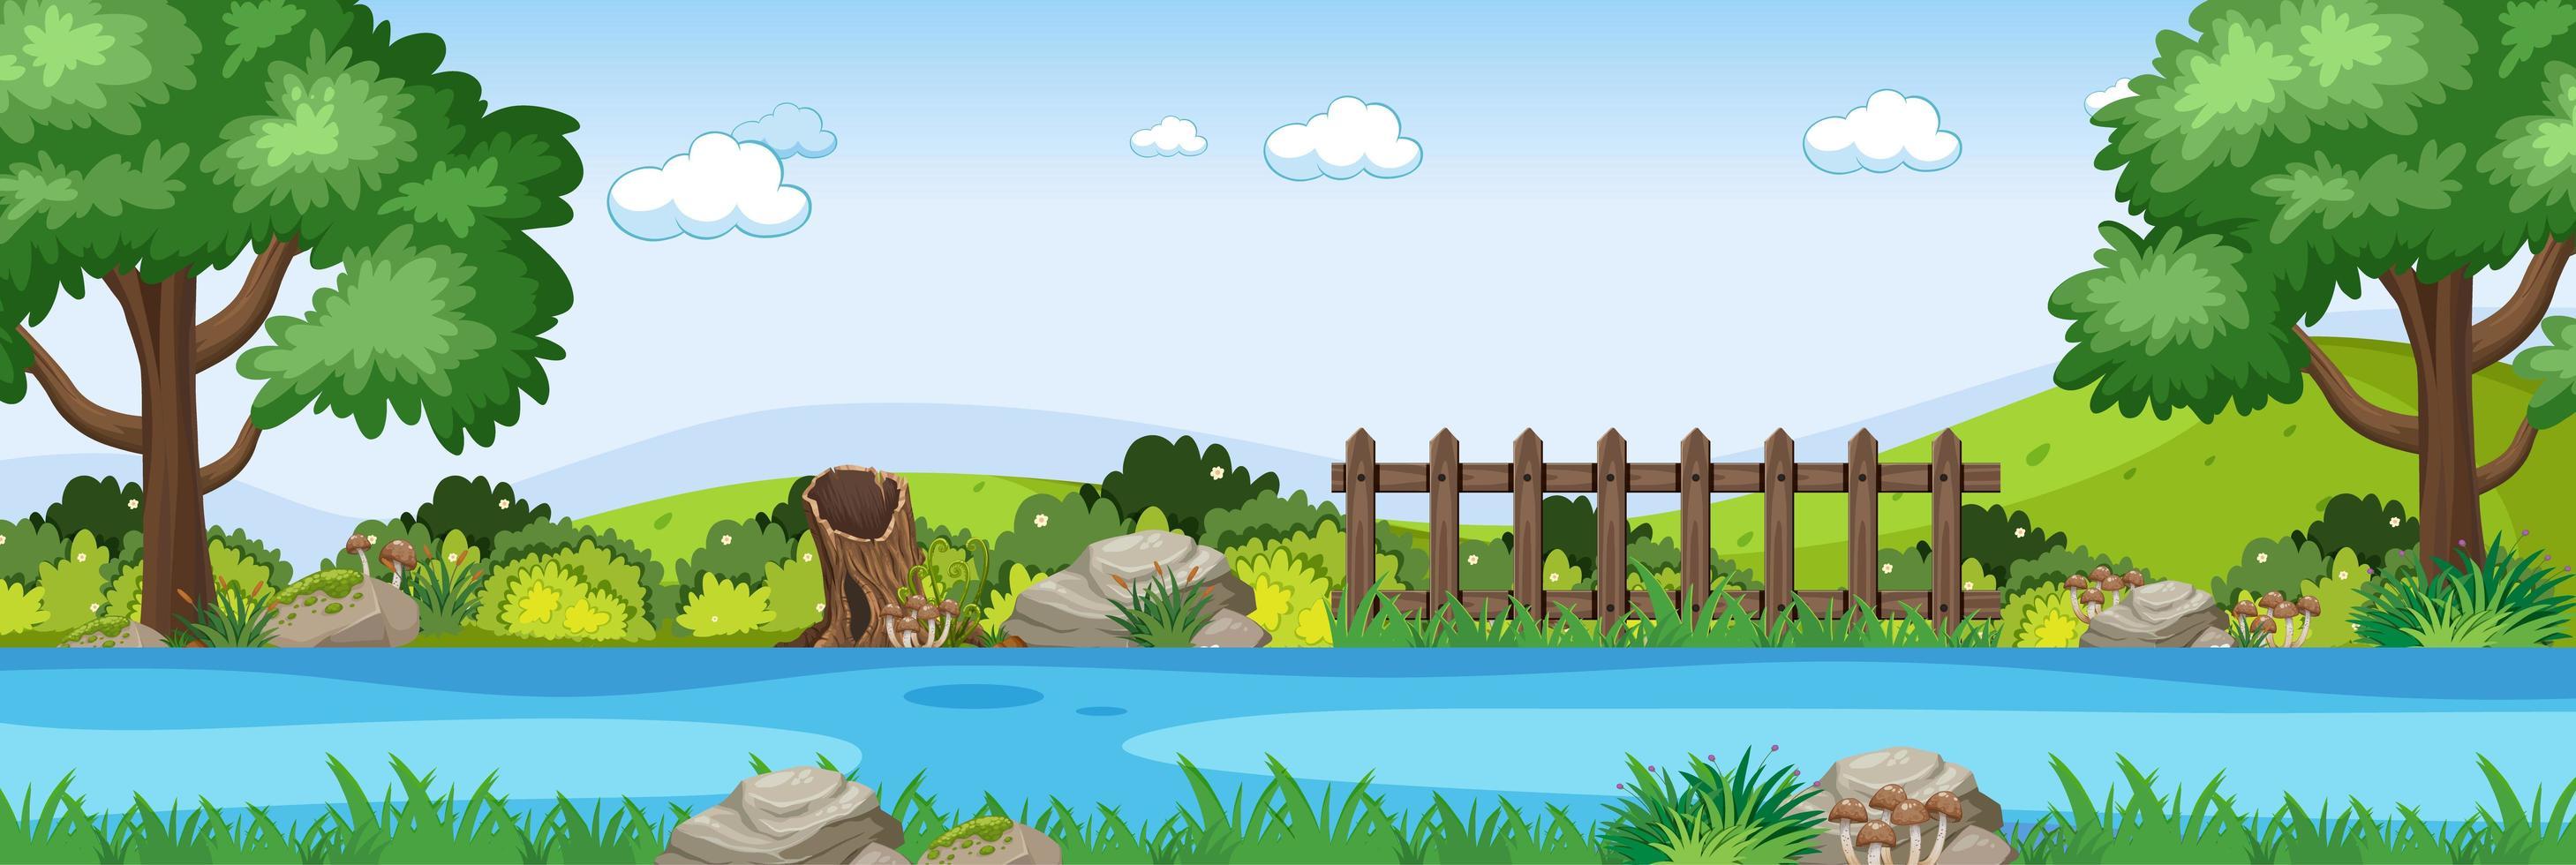 flodplats i parkens horisontella scen vektor